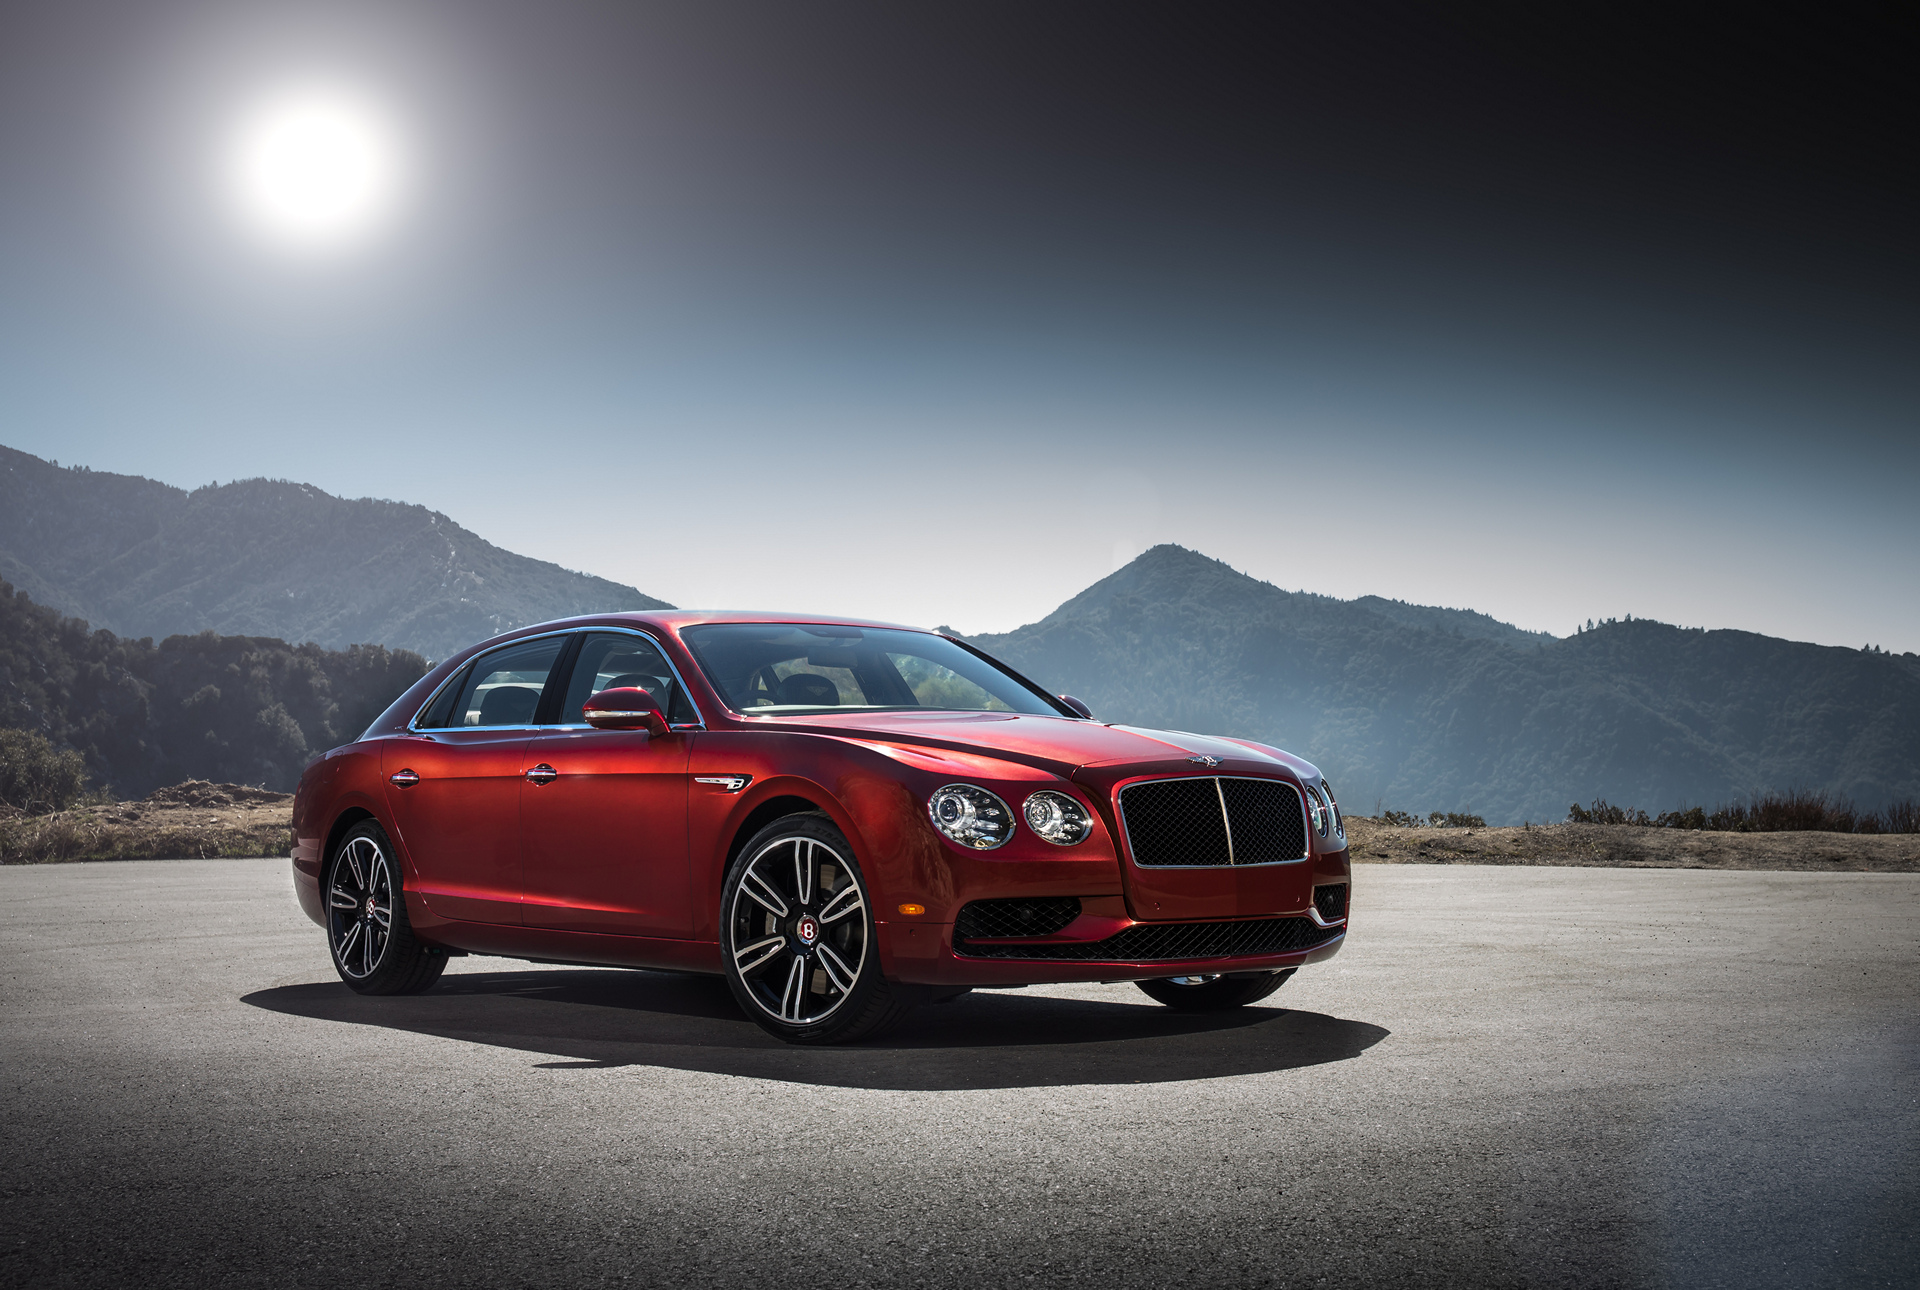 Bentley Returns to Pebble Beach with Three North-American Debuts © Volkswagen AG